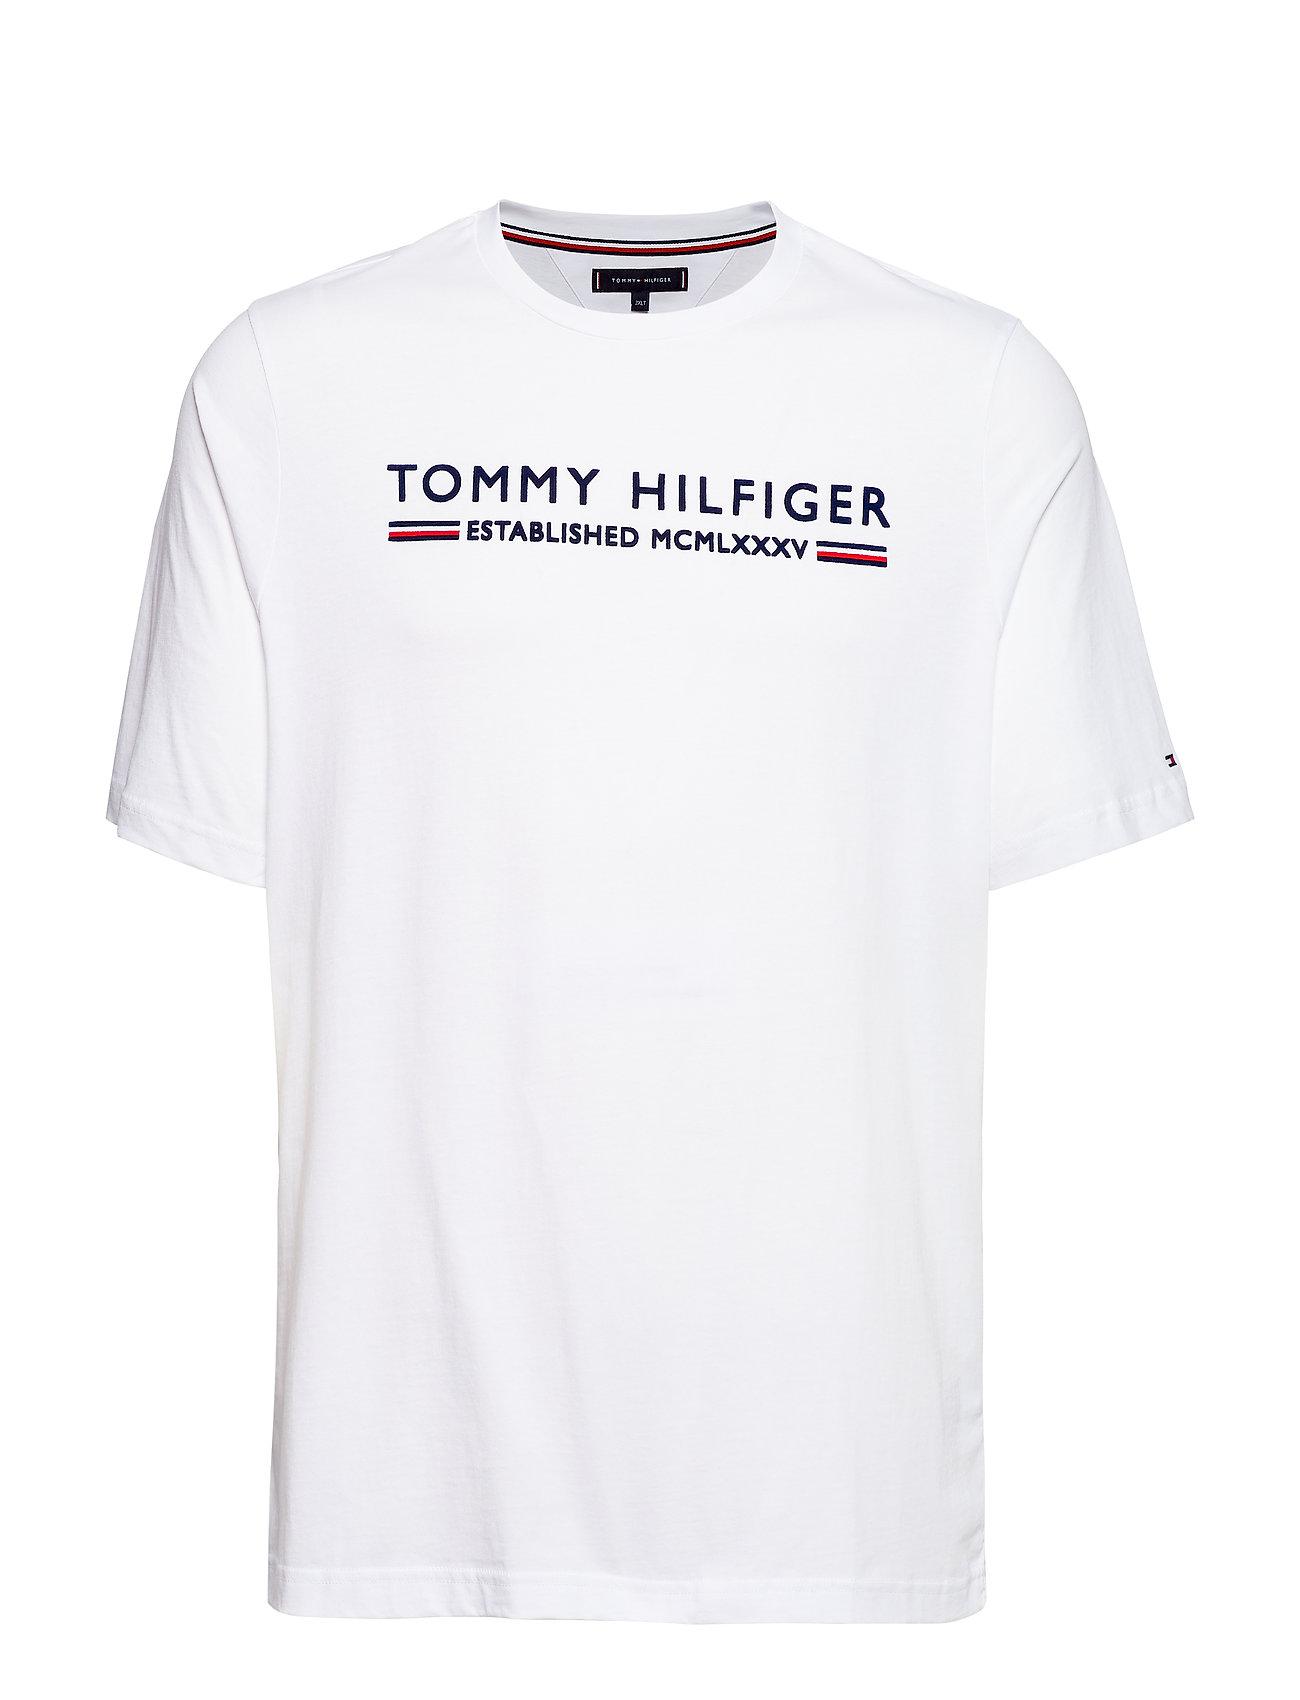 Tommy Hilfiger Big & Tall BT-TOMMY HILFIGER ES - BRIGHT WHITE